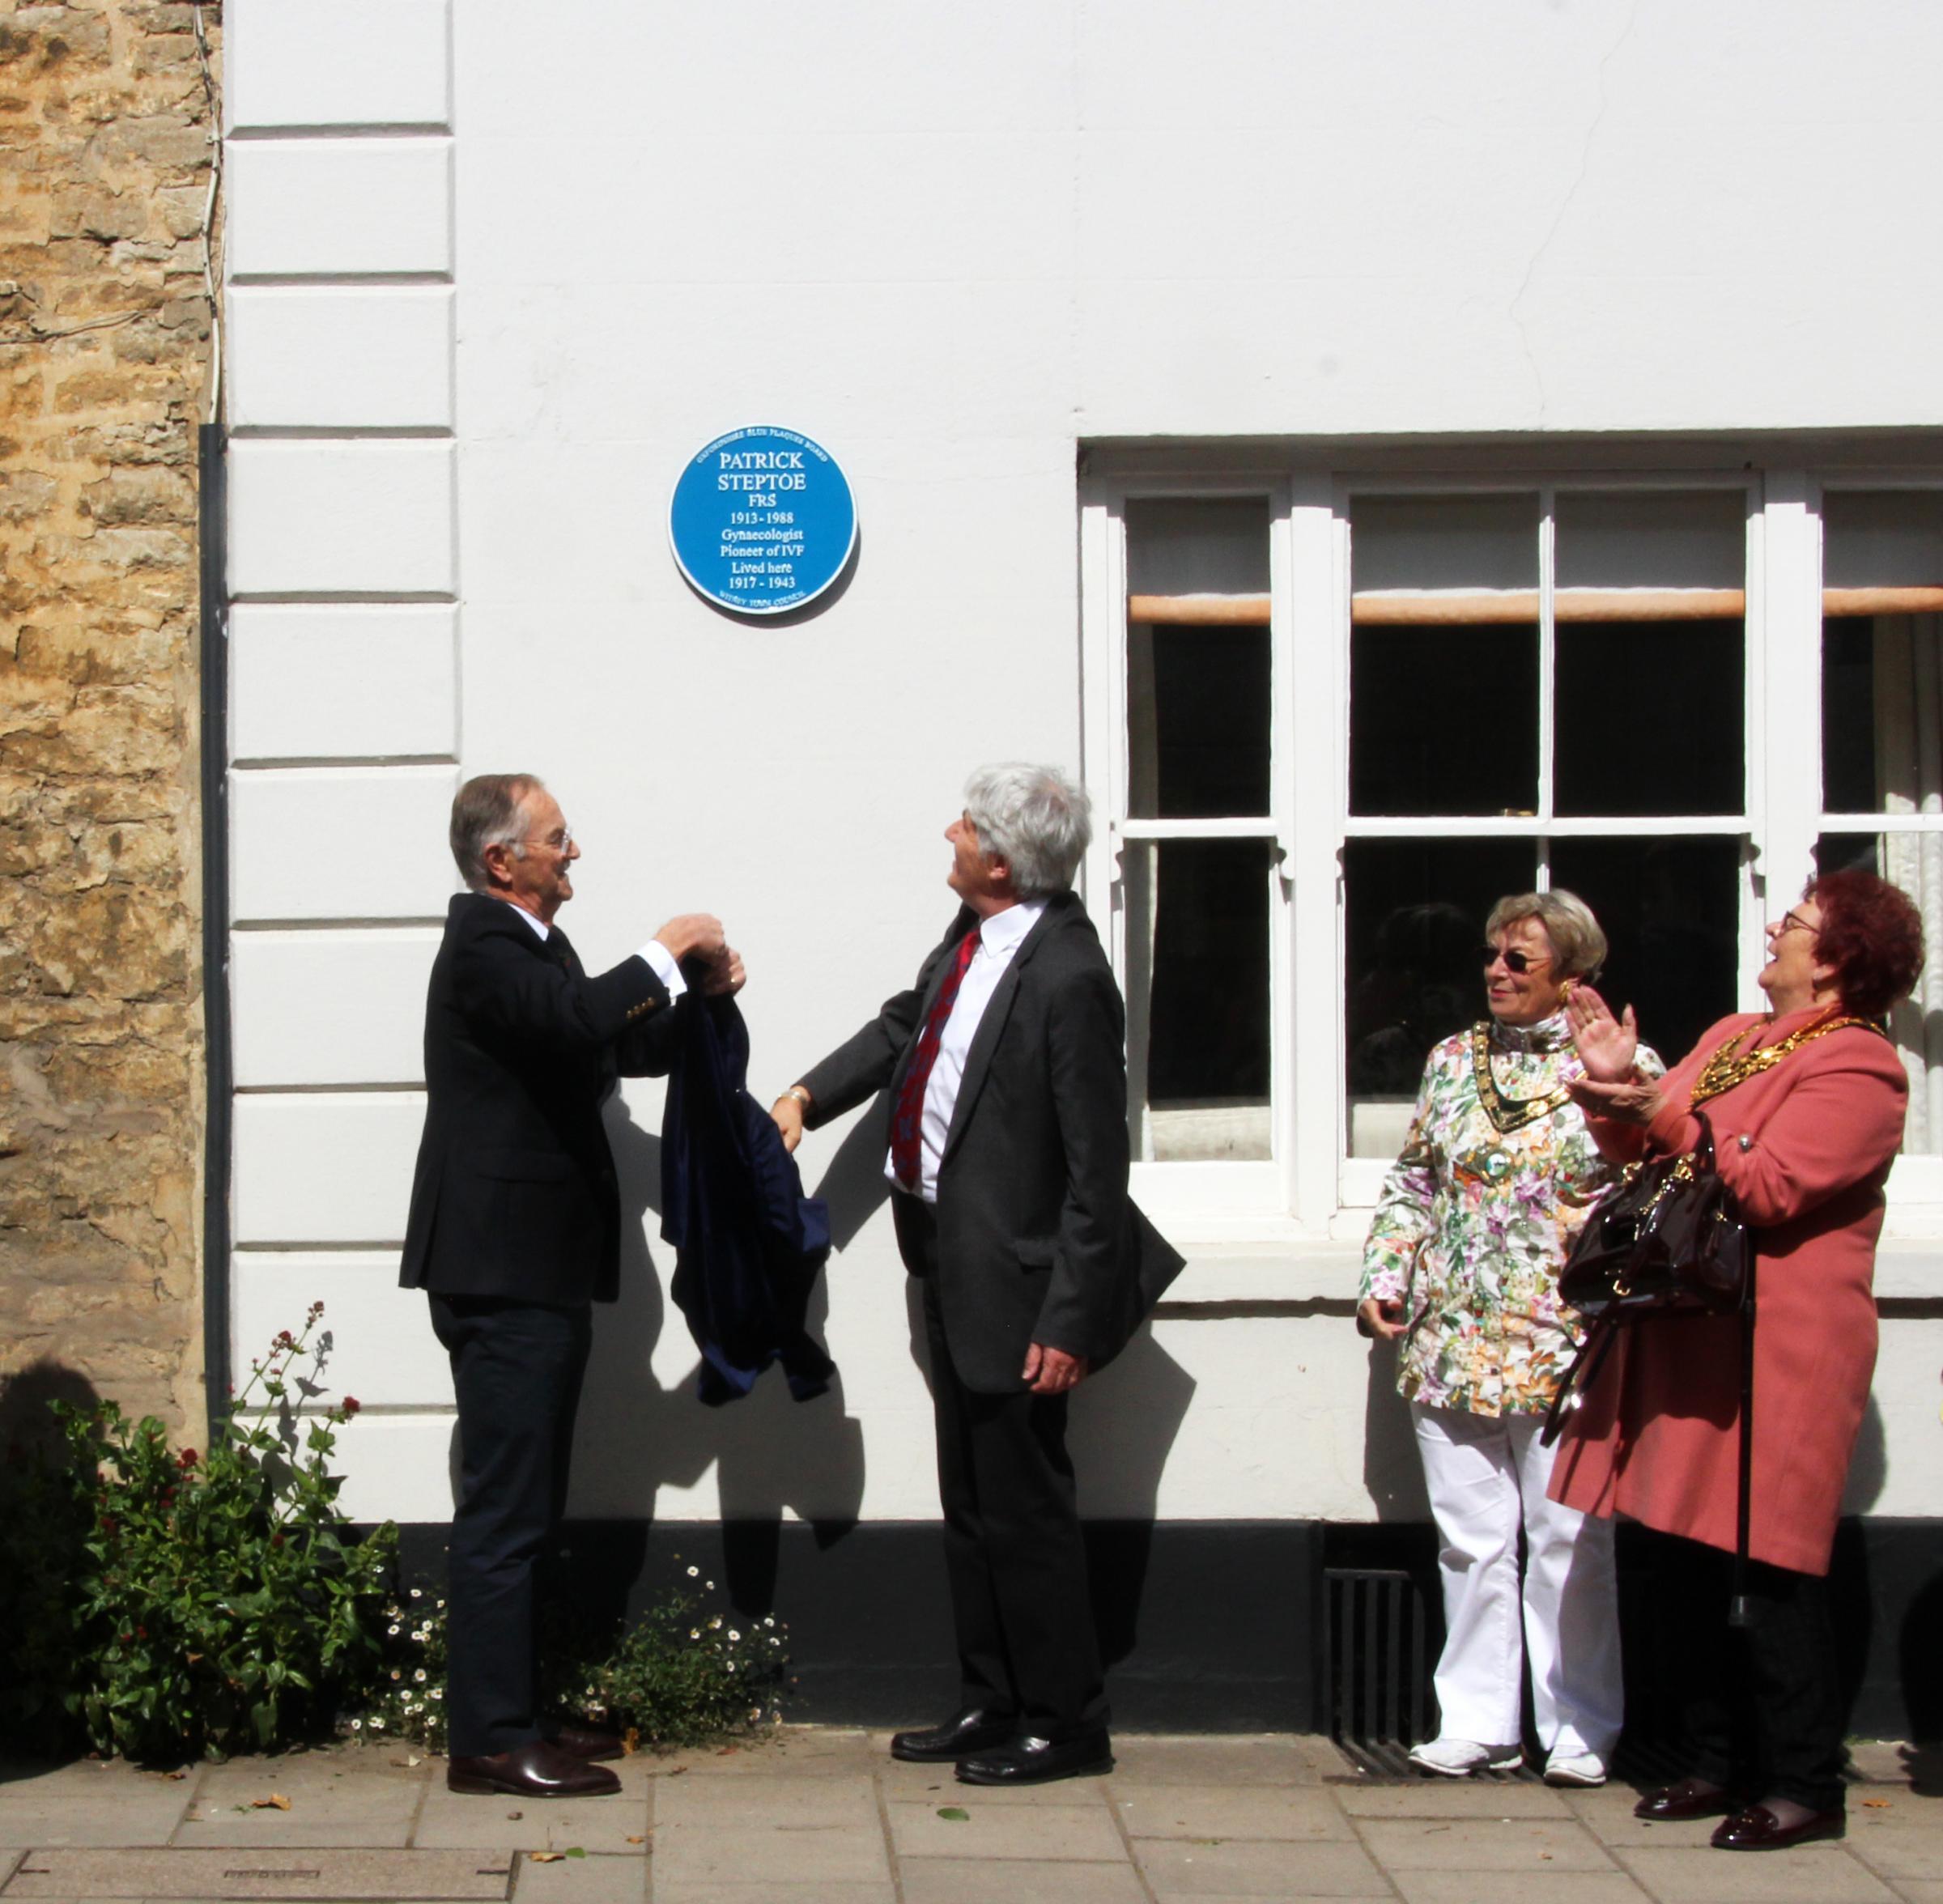 Blue plaque for IVF pioneer Patrick Steptoe in West End, Witney